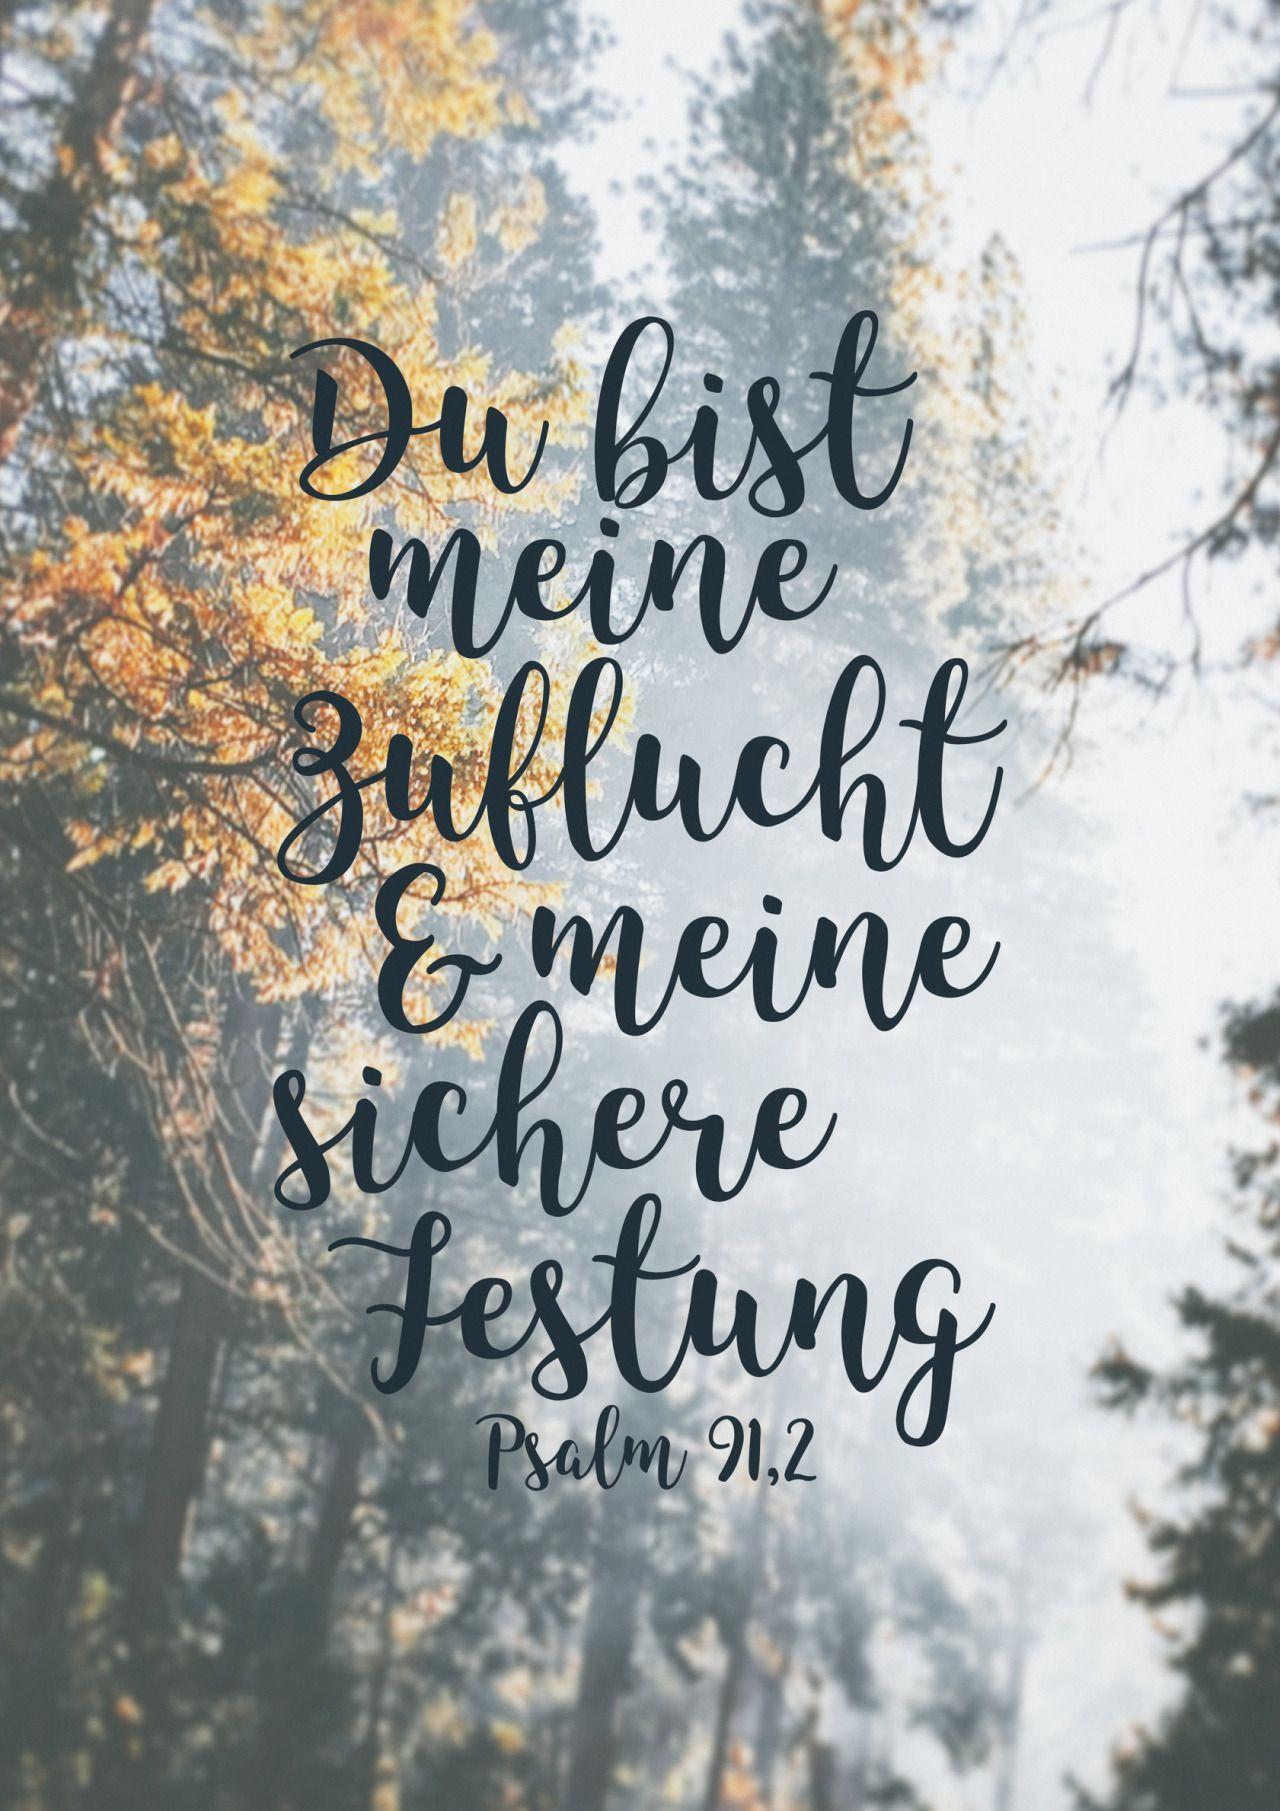 20 Besten Ideen Psalm Hochzeit Beste Wohnkultur Bastelideen Coloring Und Frisur Inspiration Psalmen Bibel Zitate Bibel Vers